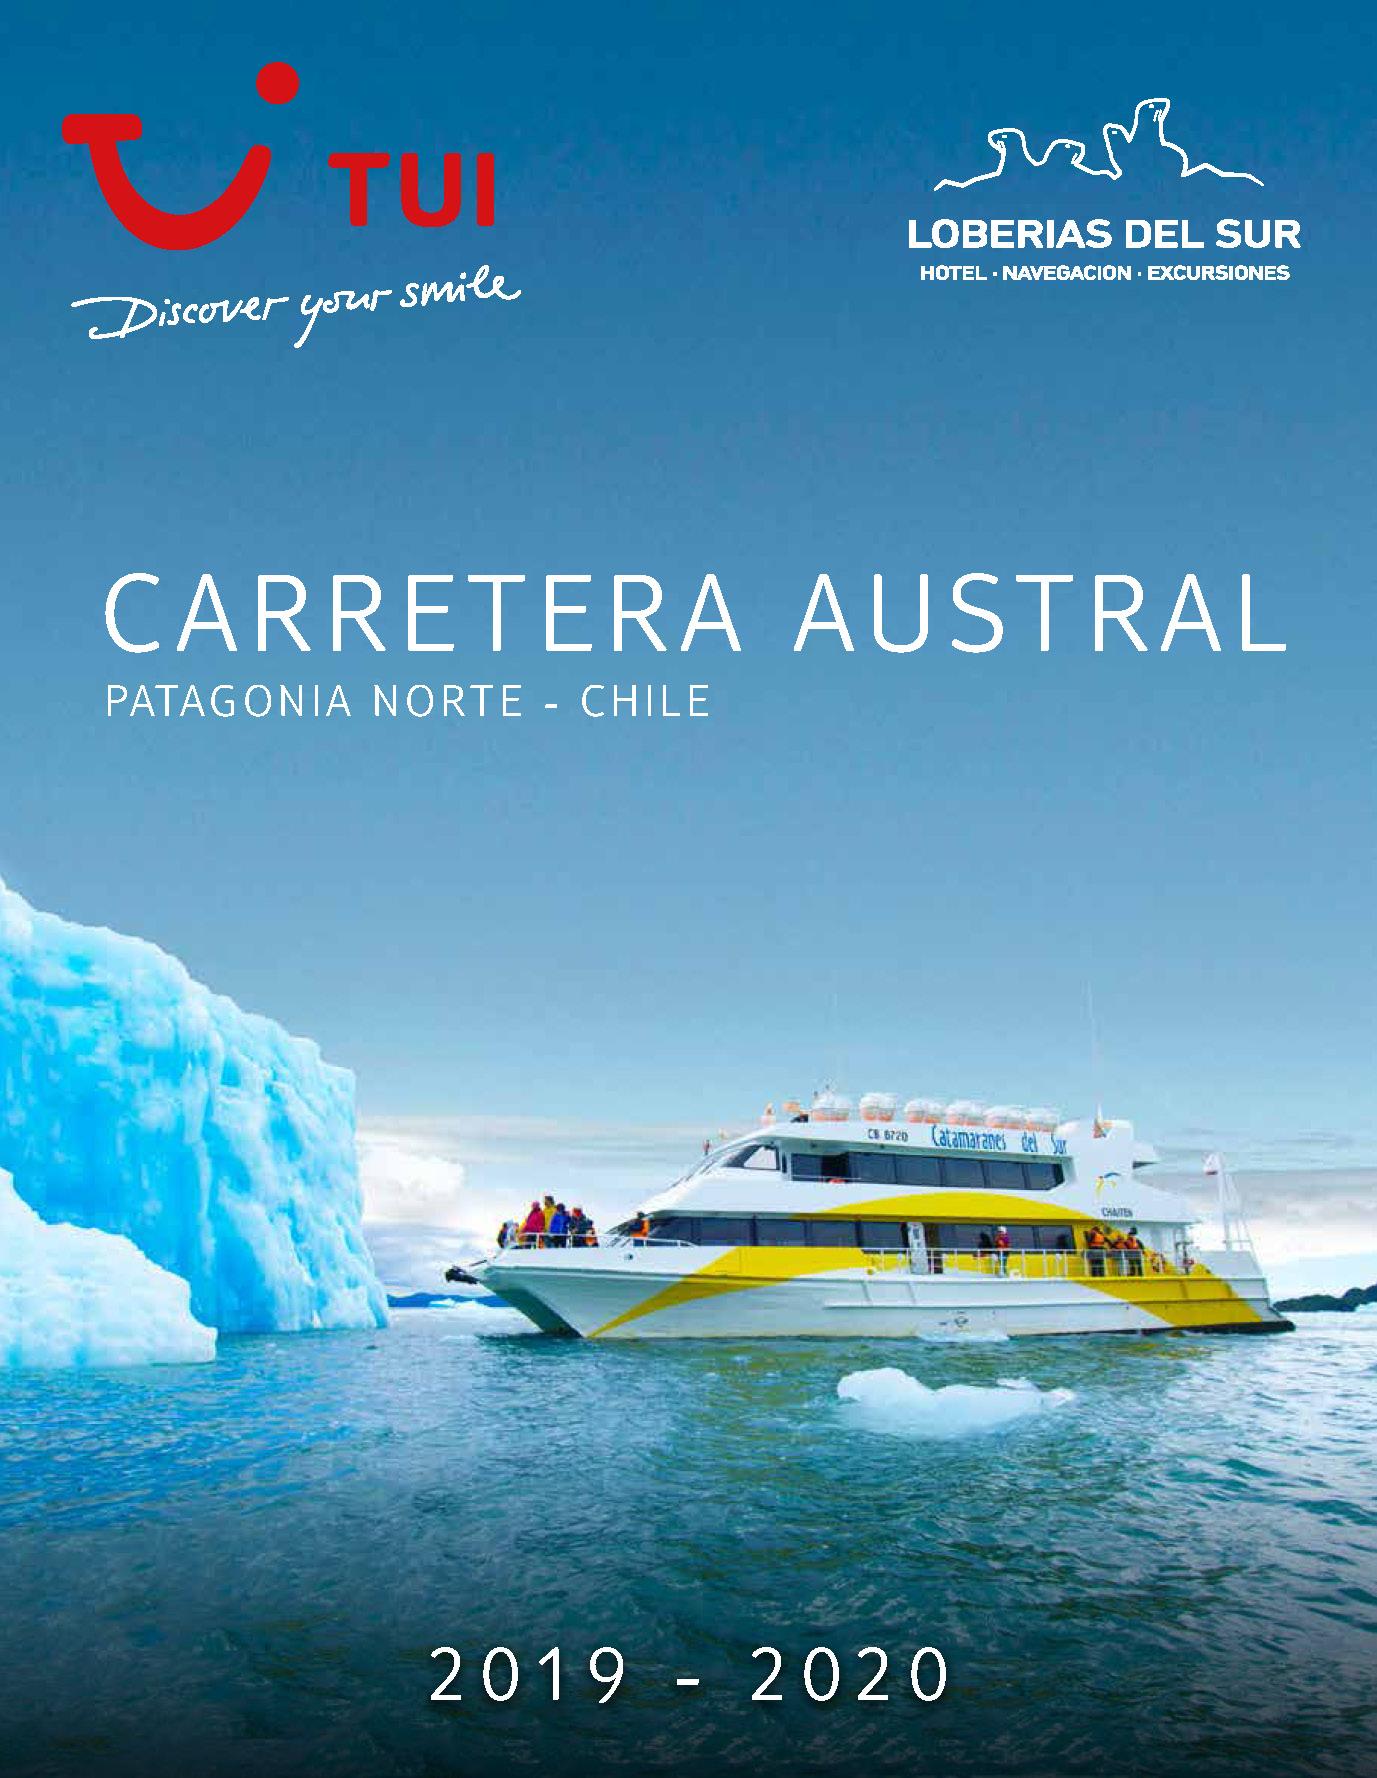 Catalogo TUI Ambassador Tours Carretera Austral Chile 2019-2020